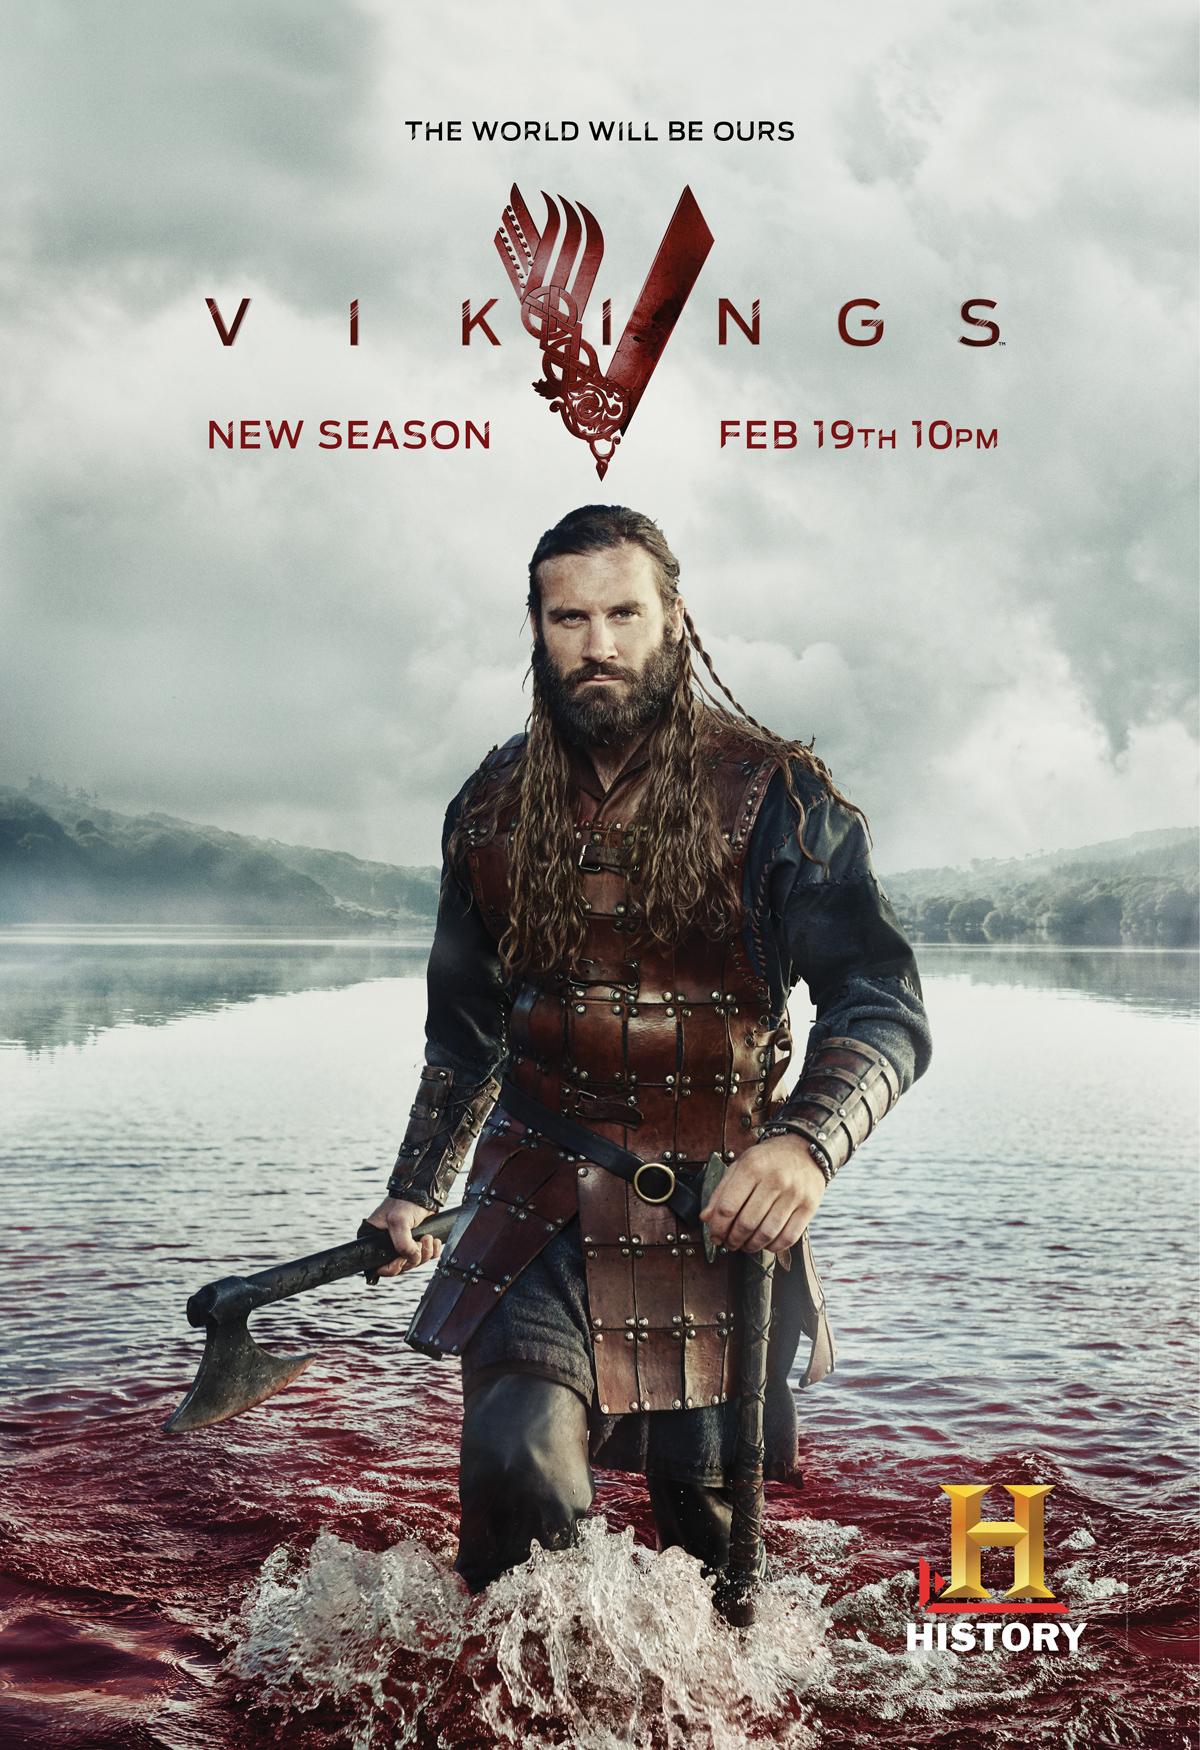 TV_History_Vikings_Poster_MitchJenkins.jpg